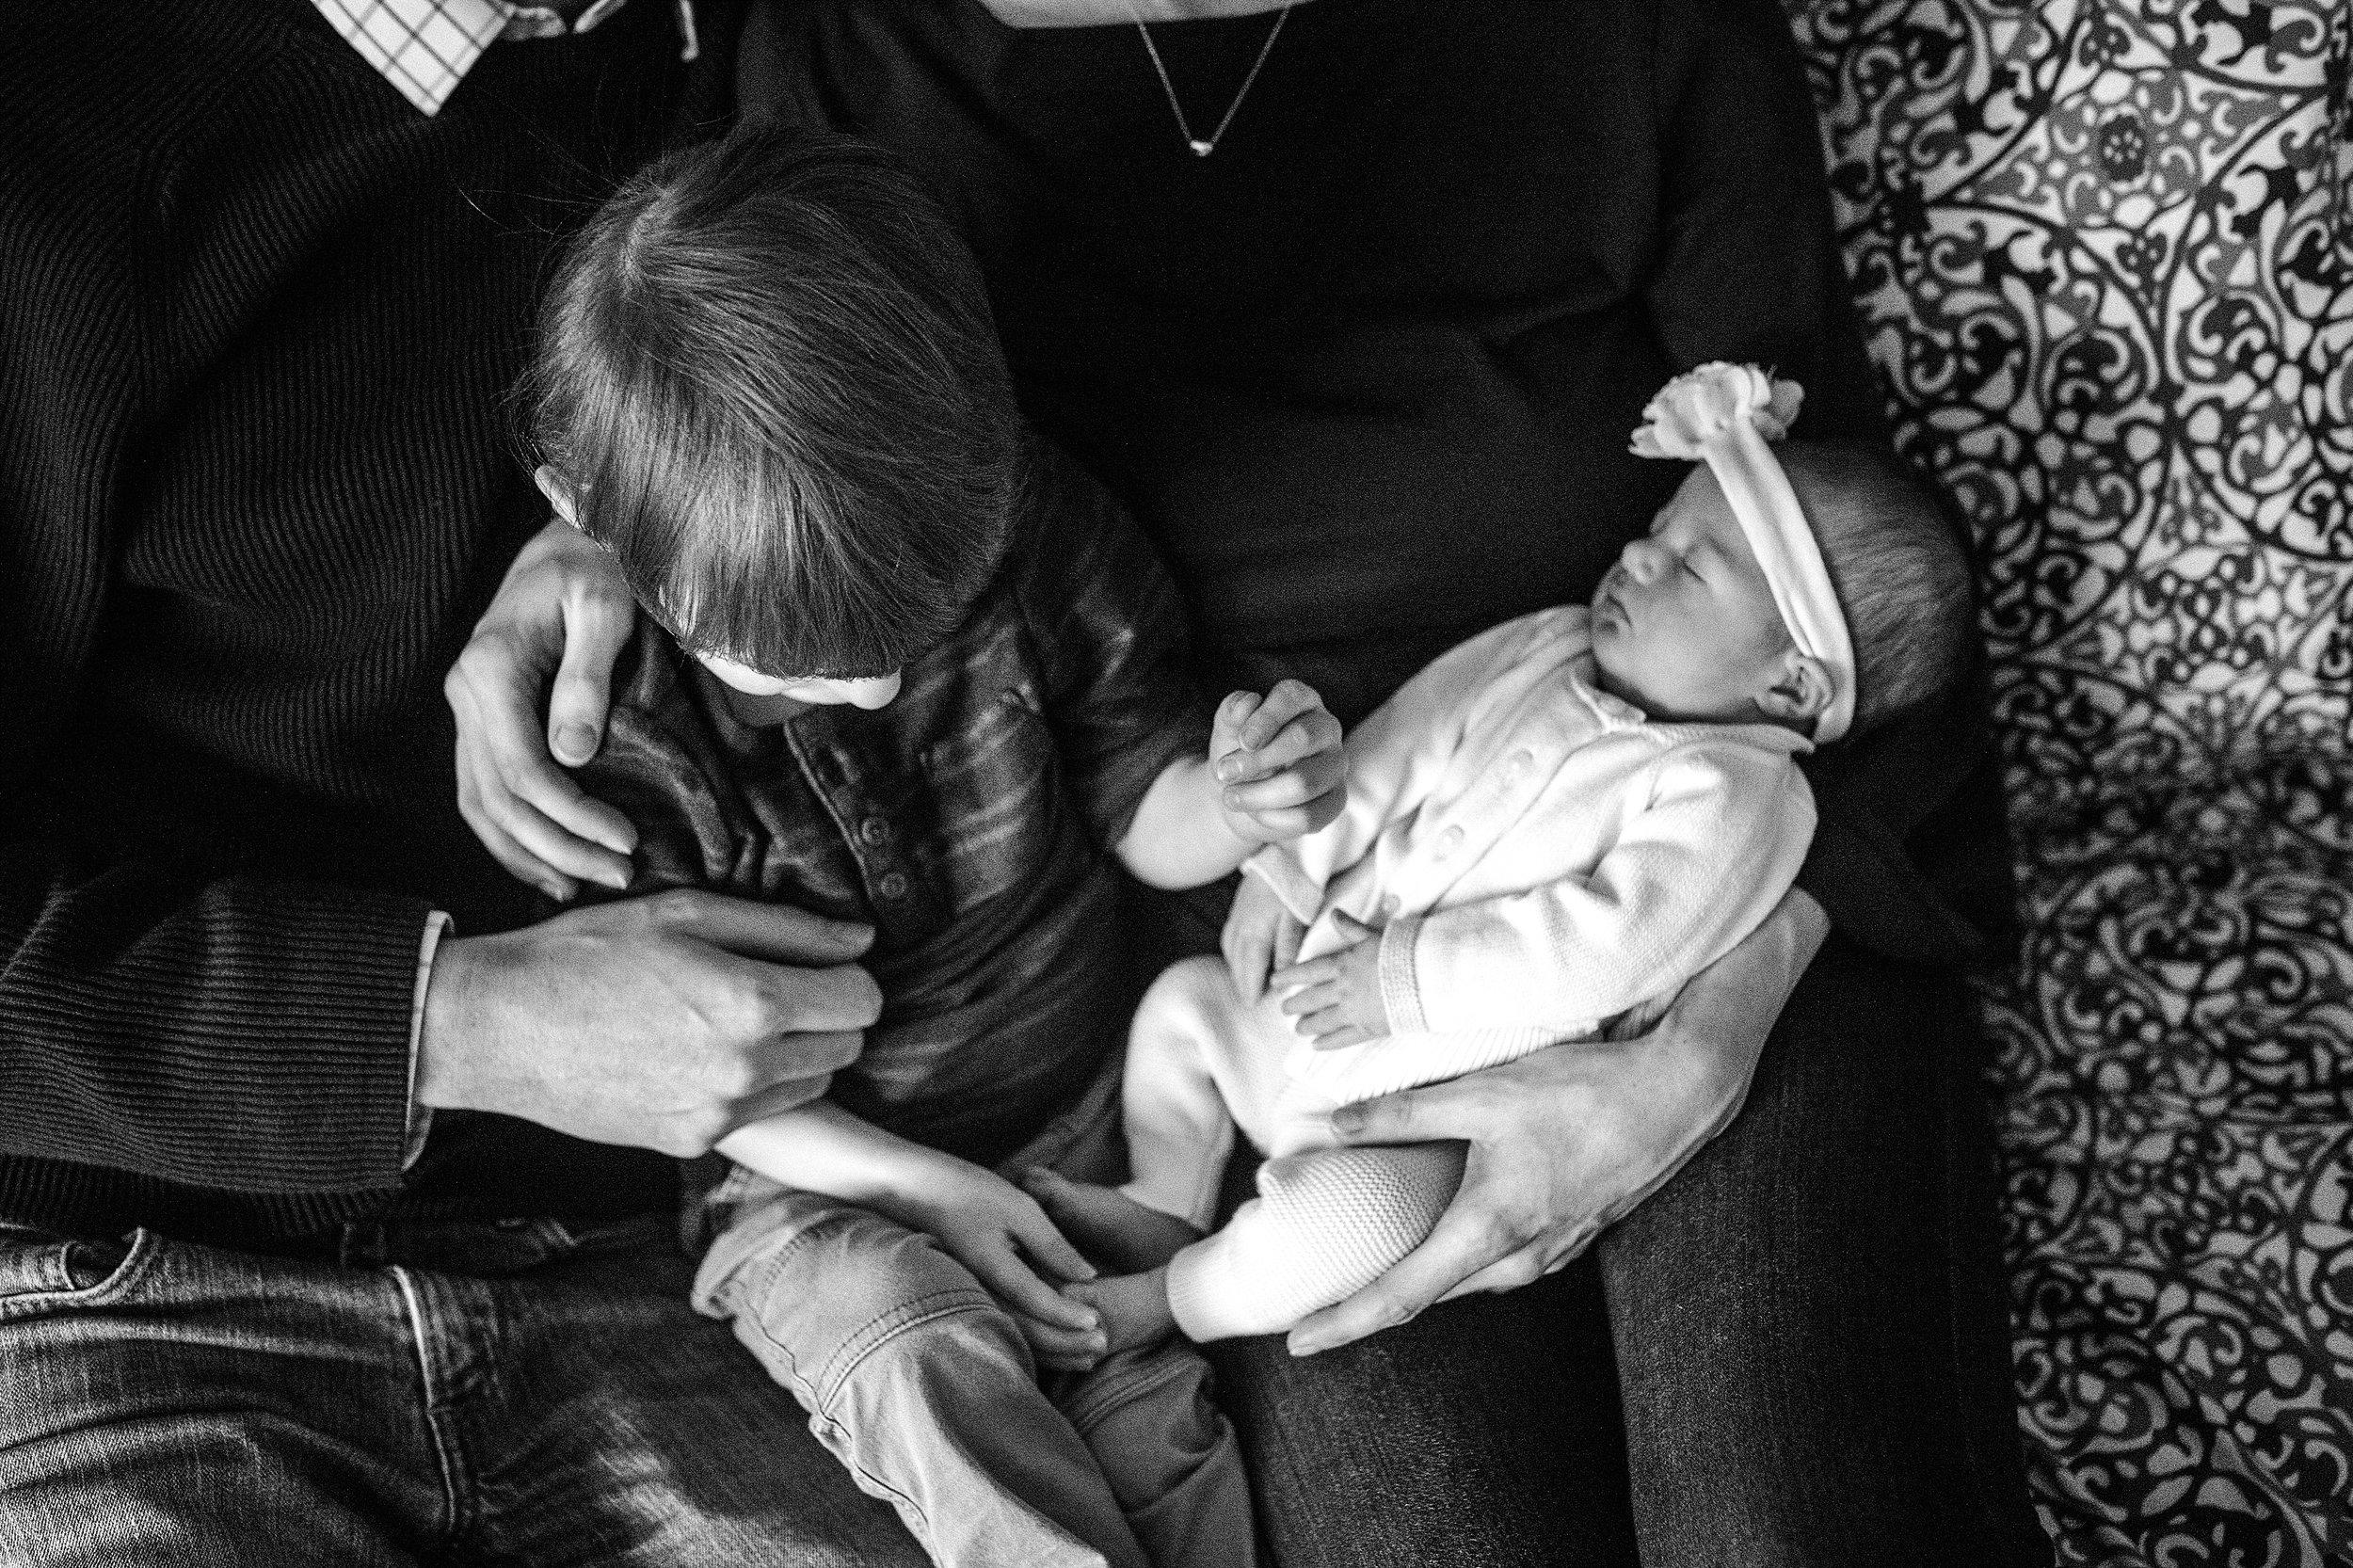 Lehigh-Valley-Newborn-Documentary-Photographer_0013.jpg